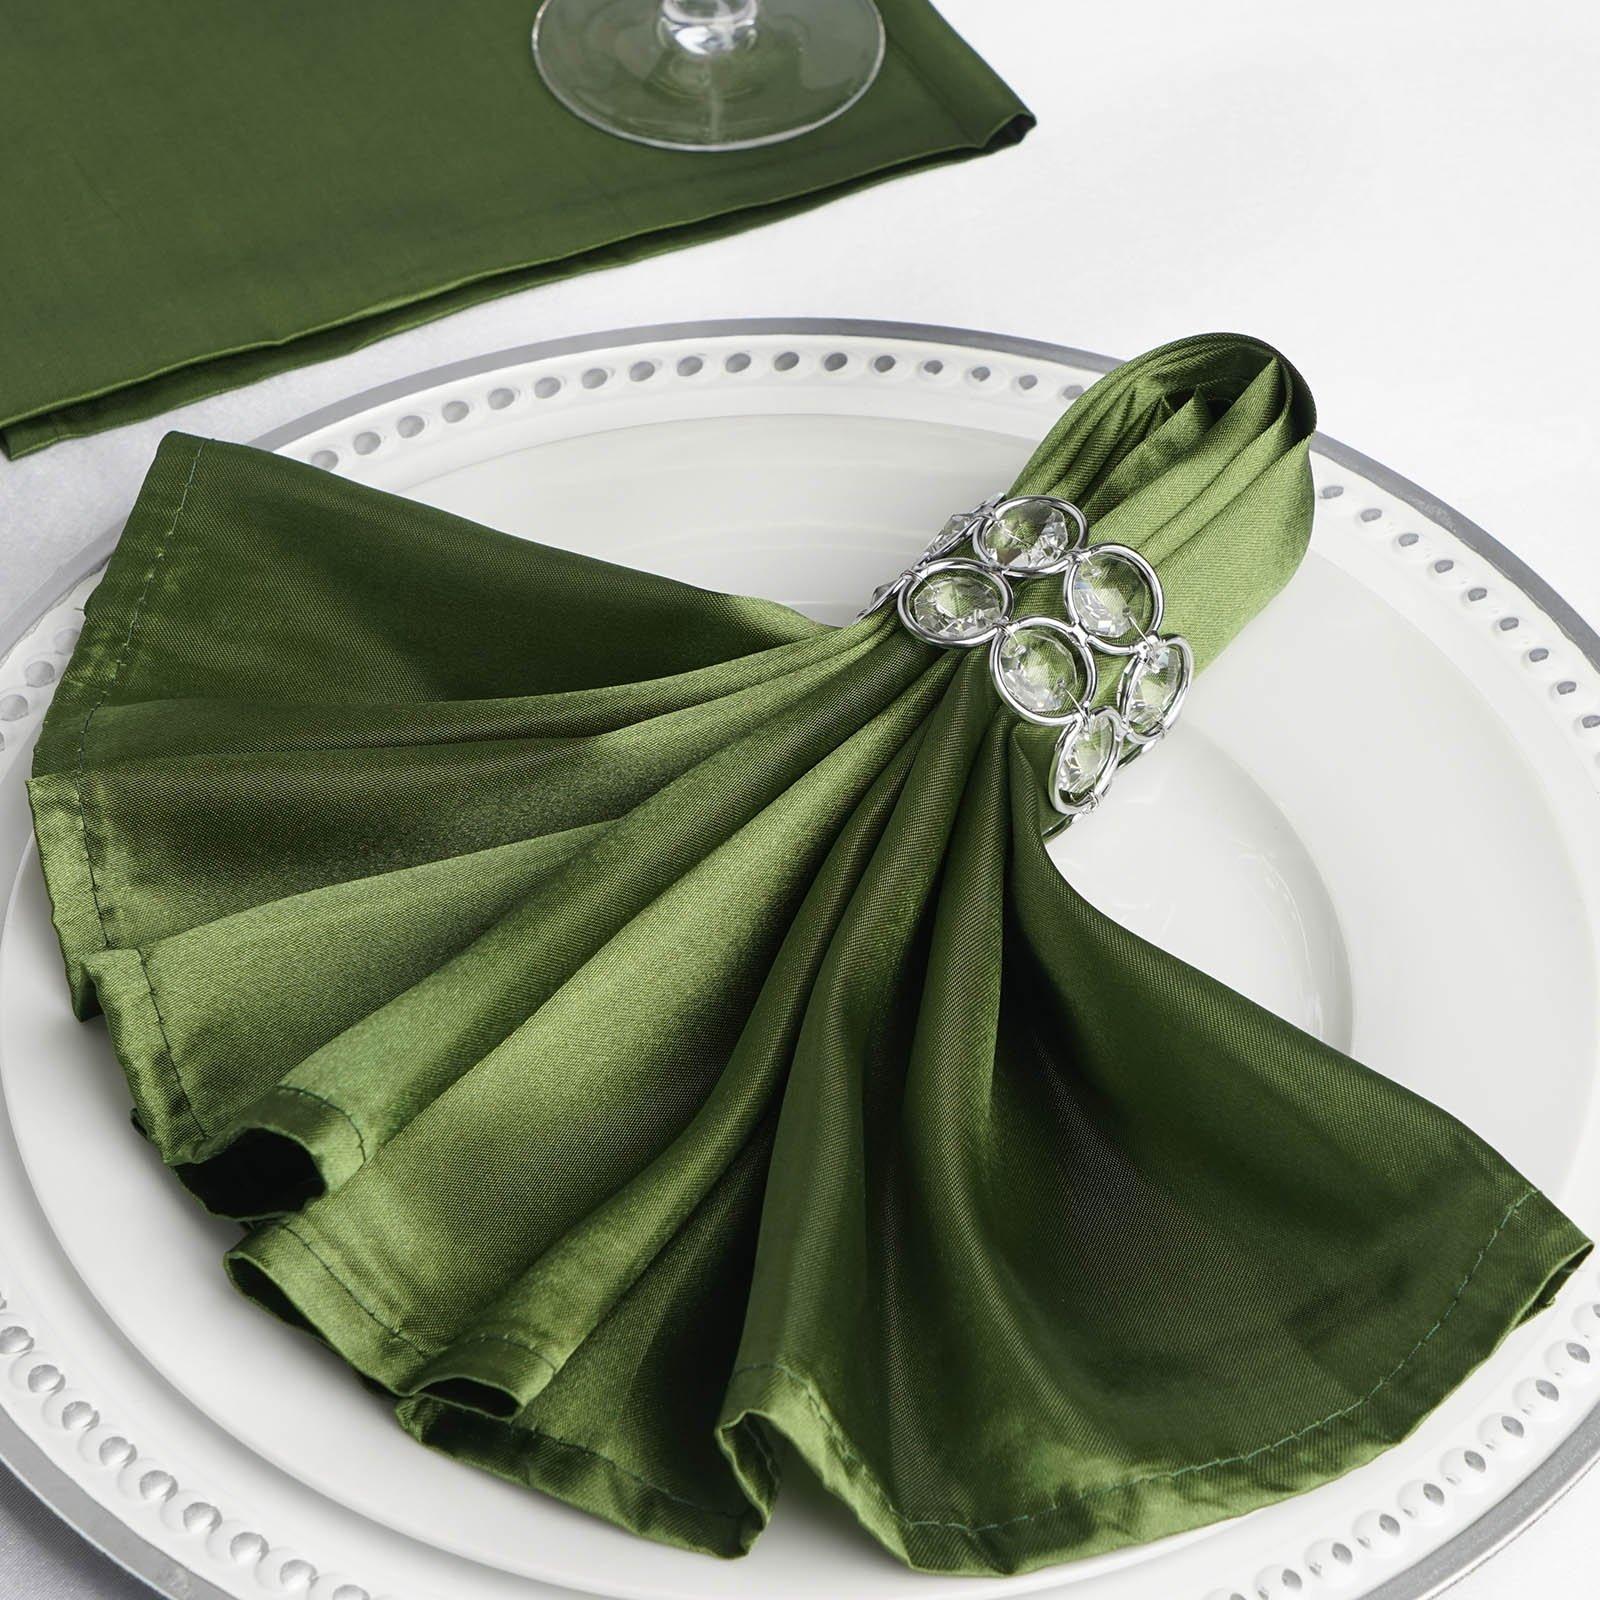 Efavormart 20''x20'' Moss/Willow Wholesale Satin Linen Napkins for Wedding Birthday Restaurant Party Tableware Decoration - 5 PCS